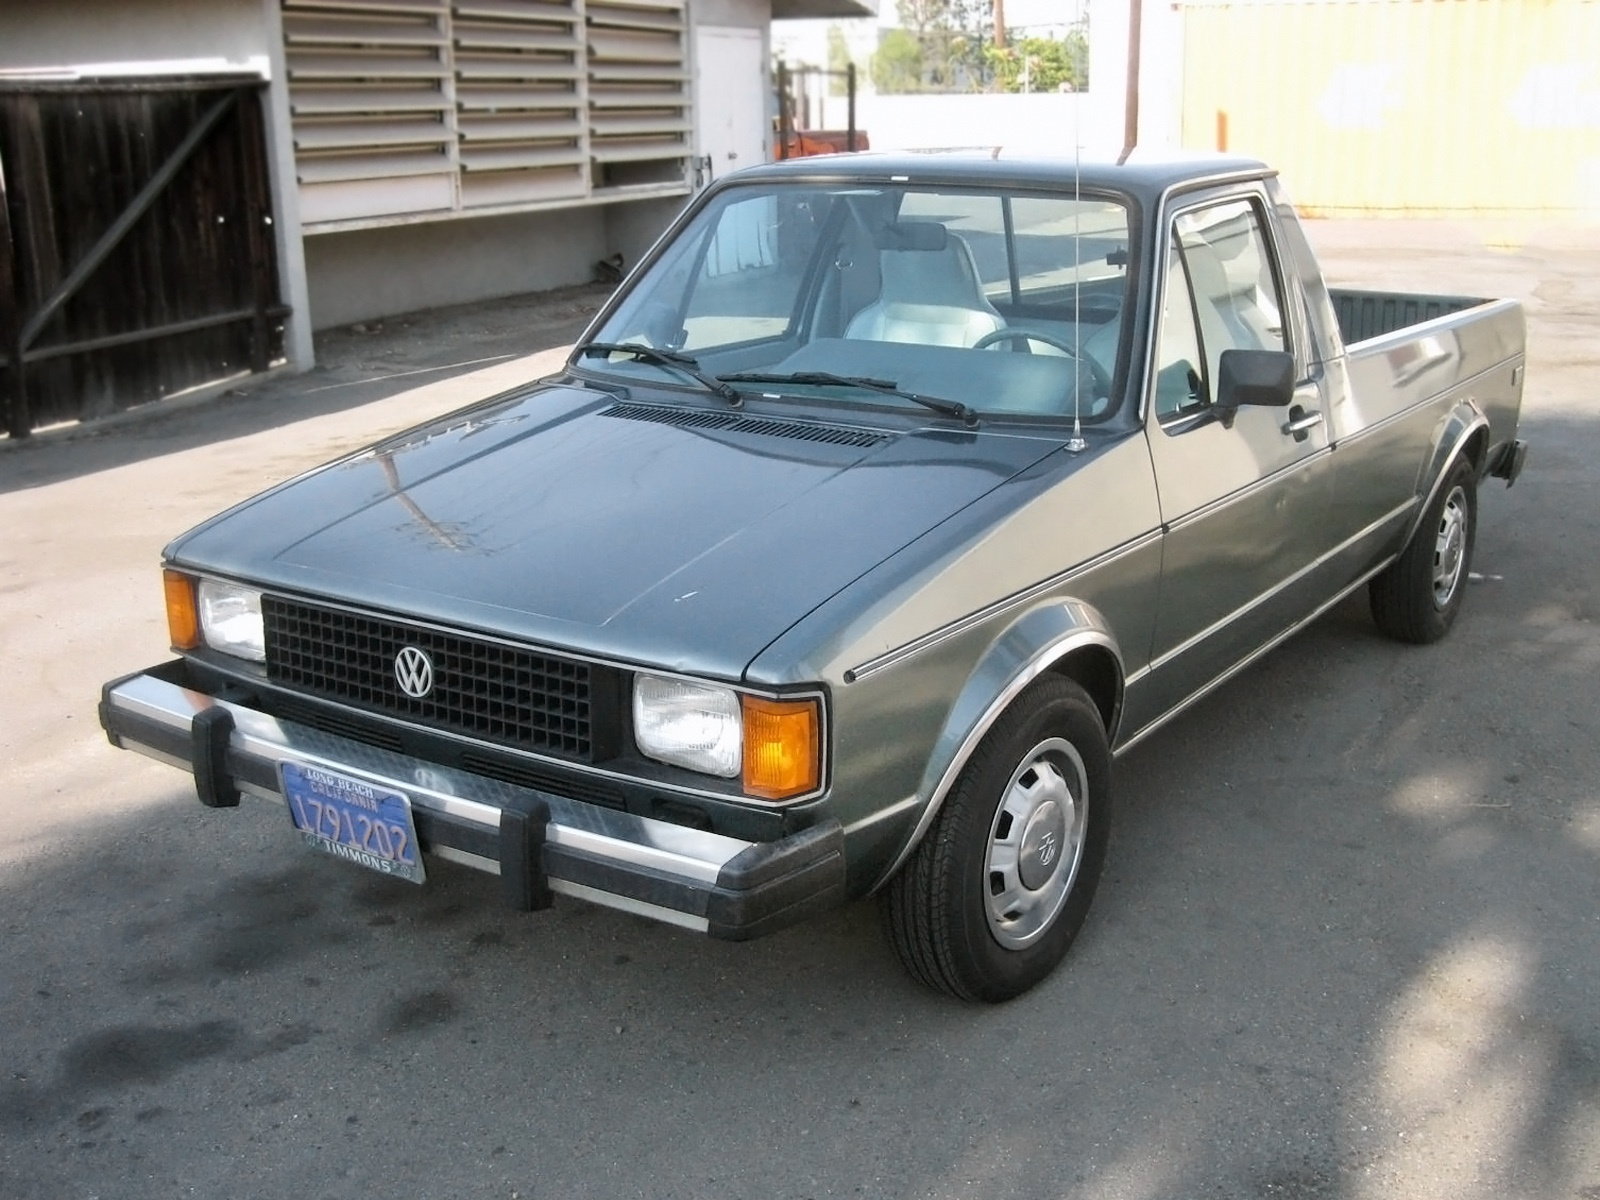 Vw Diesel Truck >> Diesel Power 1981 Volkswagen Rabbit Pickup Lx